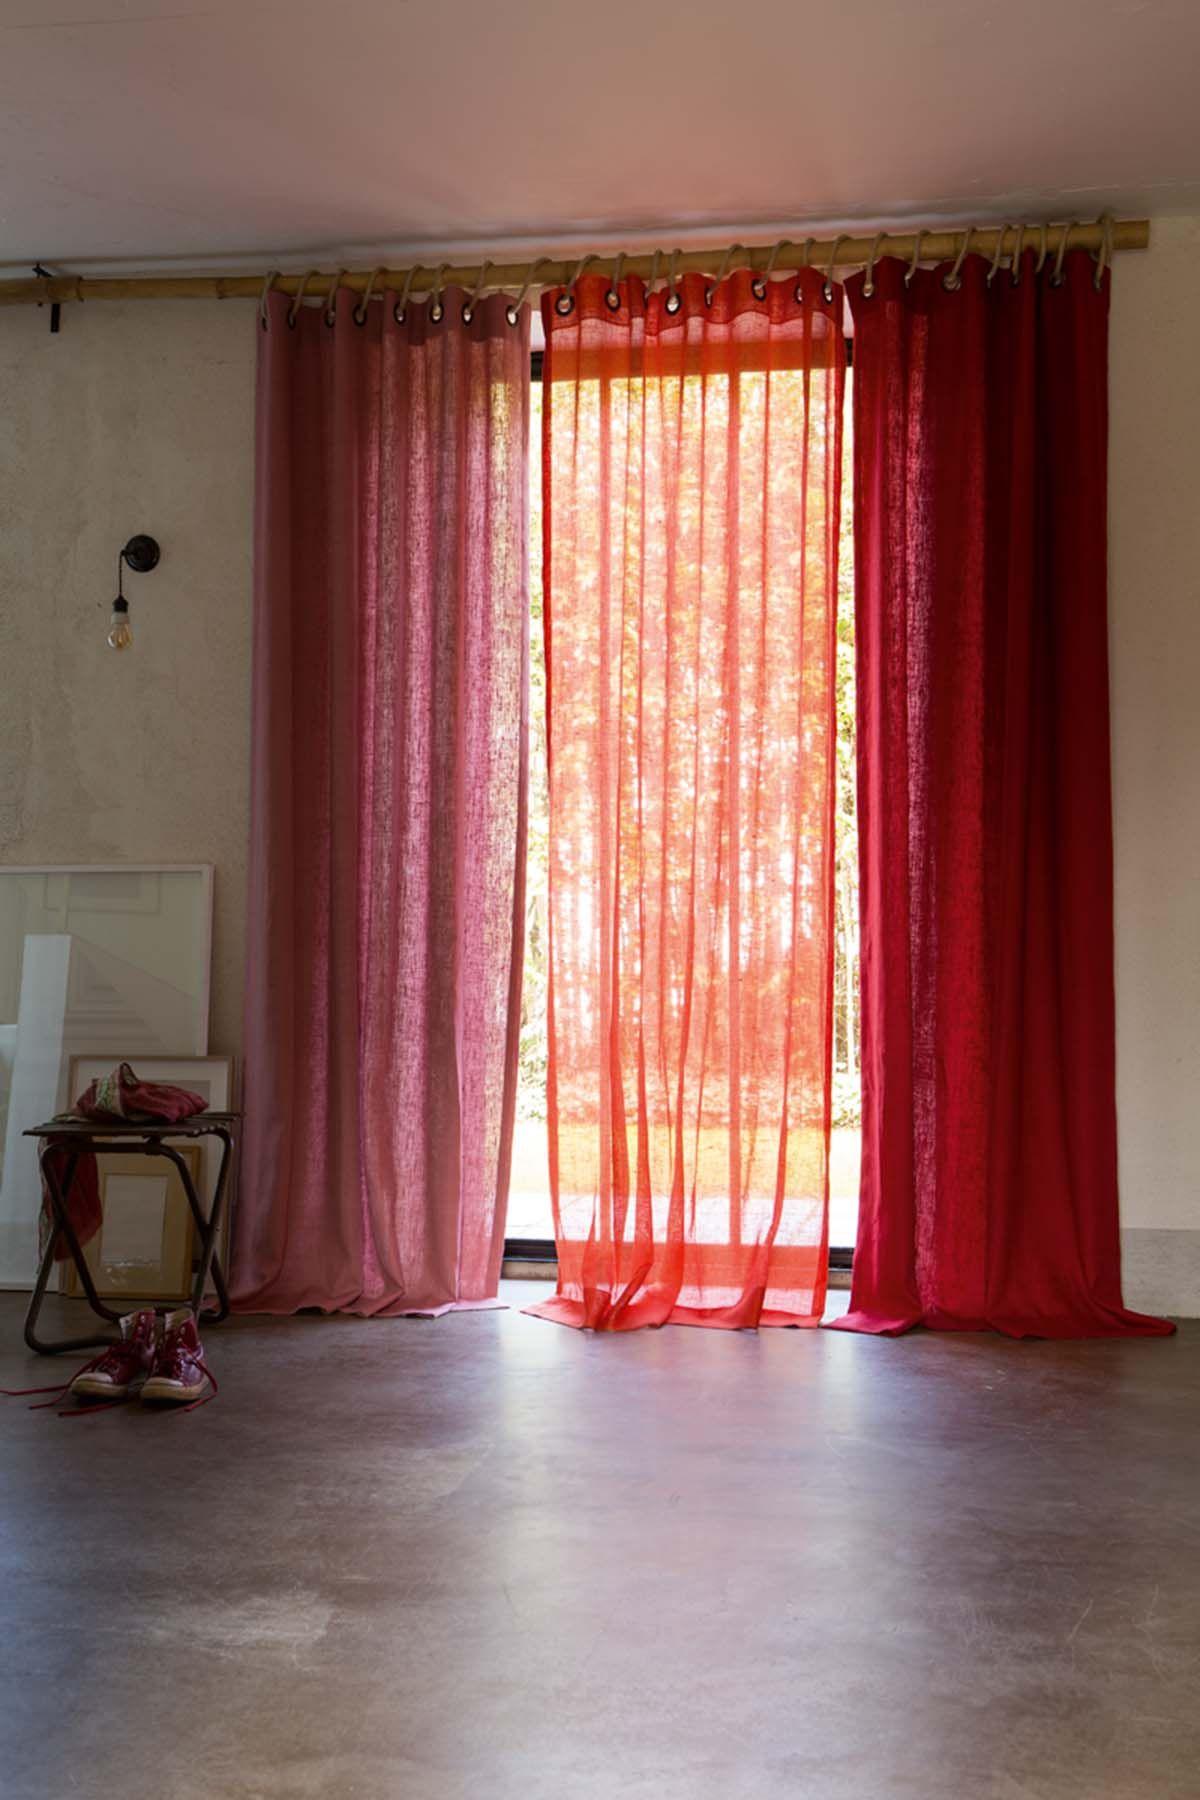 voilages confection lin terracotta orang s m pinterest terracotta voilages et deco rouge. Black Bedroom Furniture Sets. Home Design Ideas